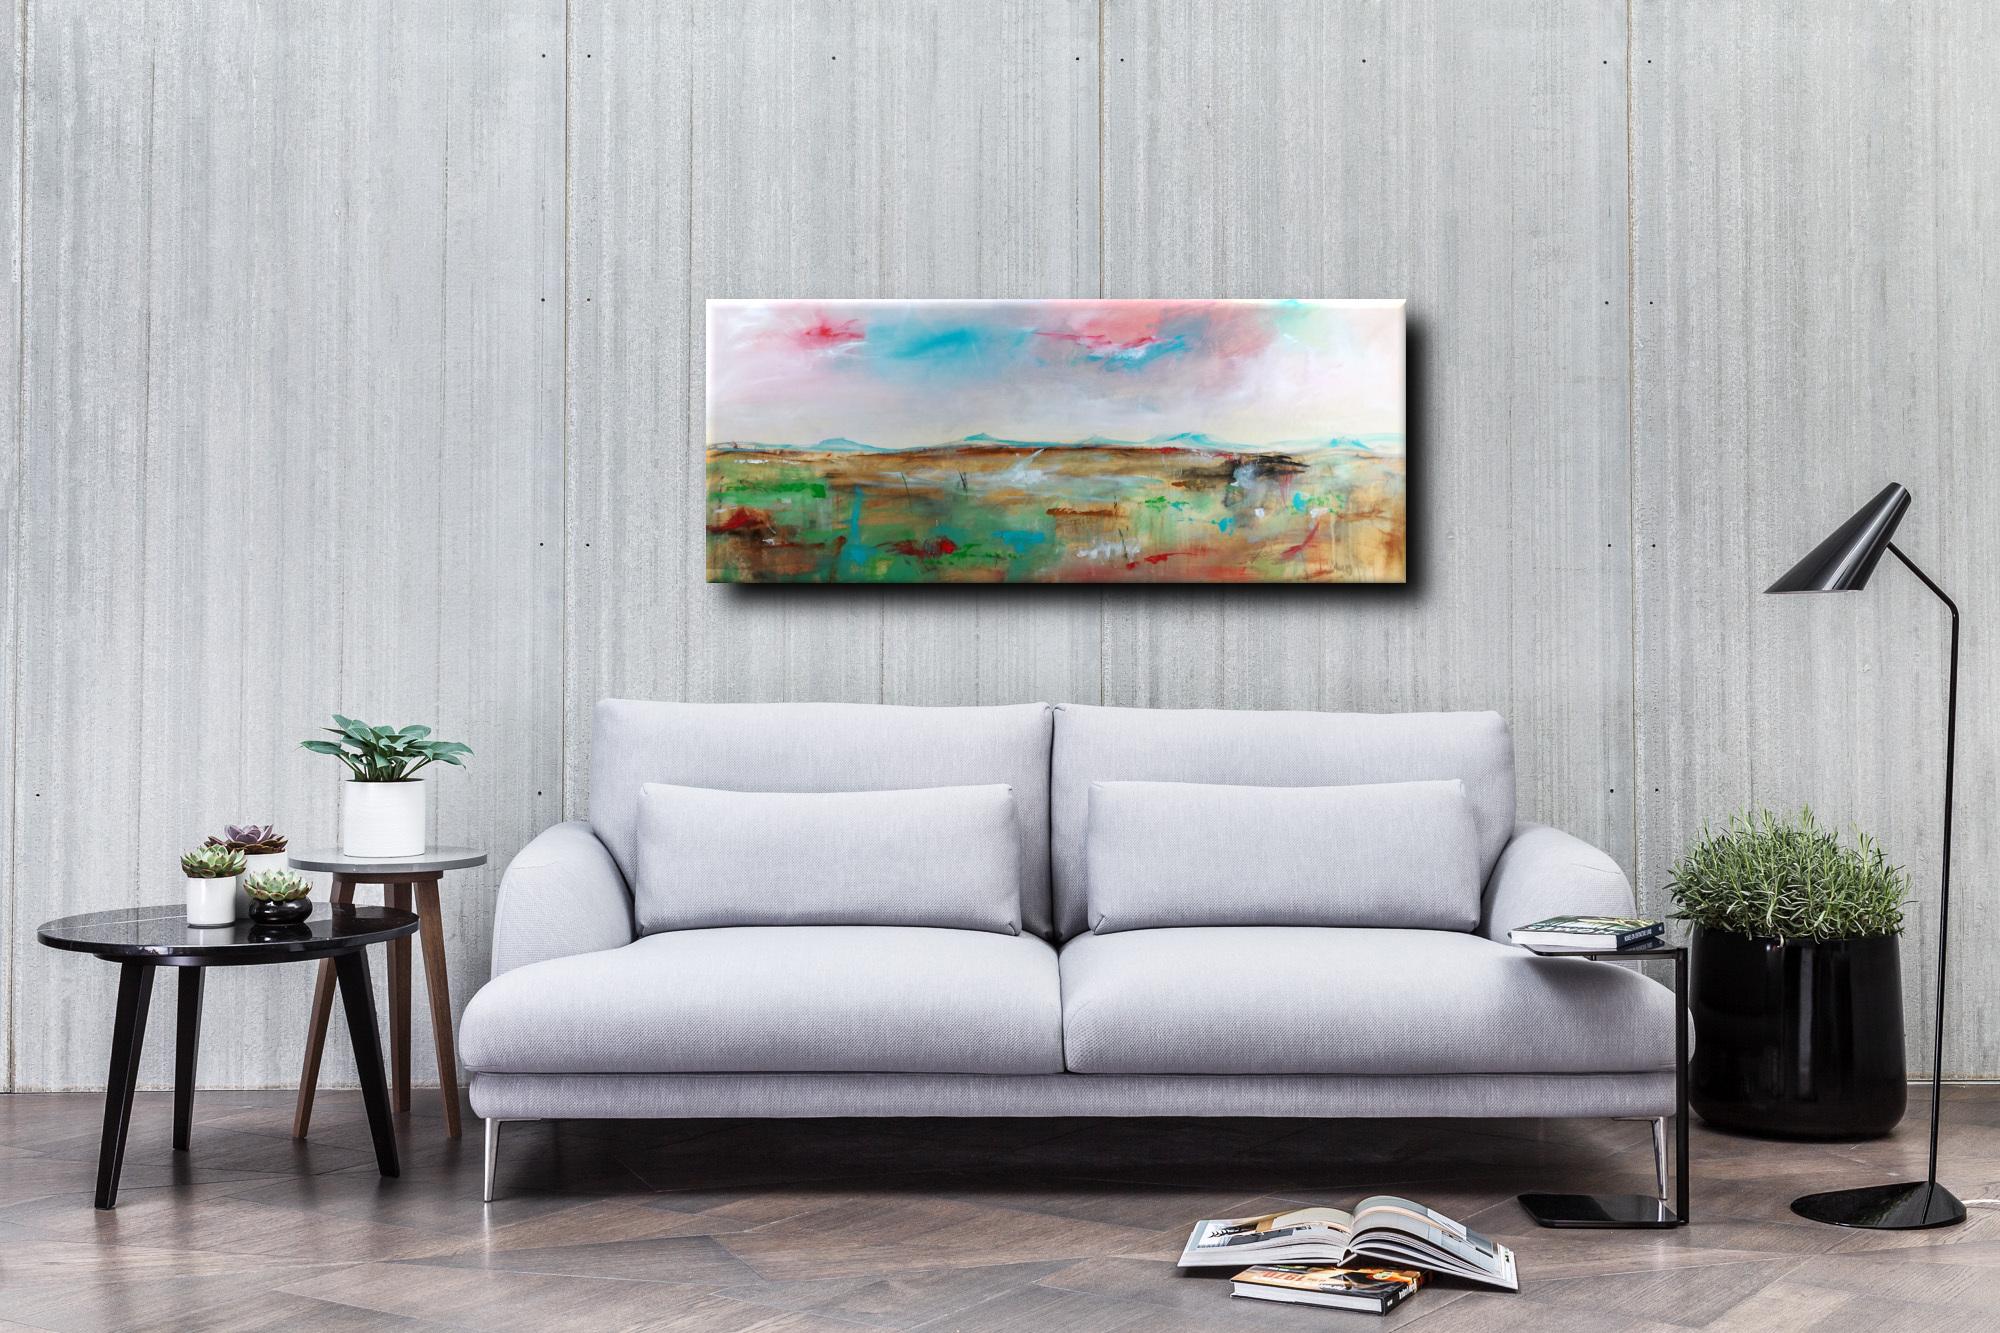 quadri-dipinti-a-mano-su-tela-c094 | sauro bos